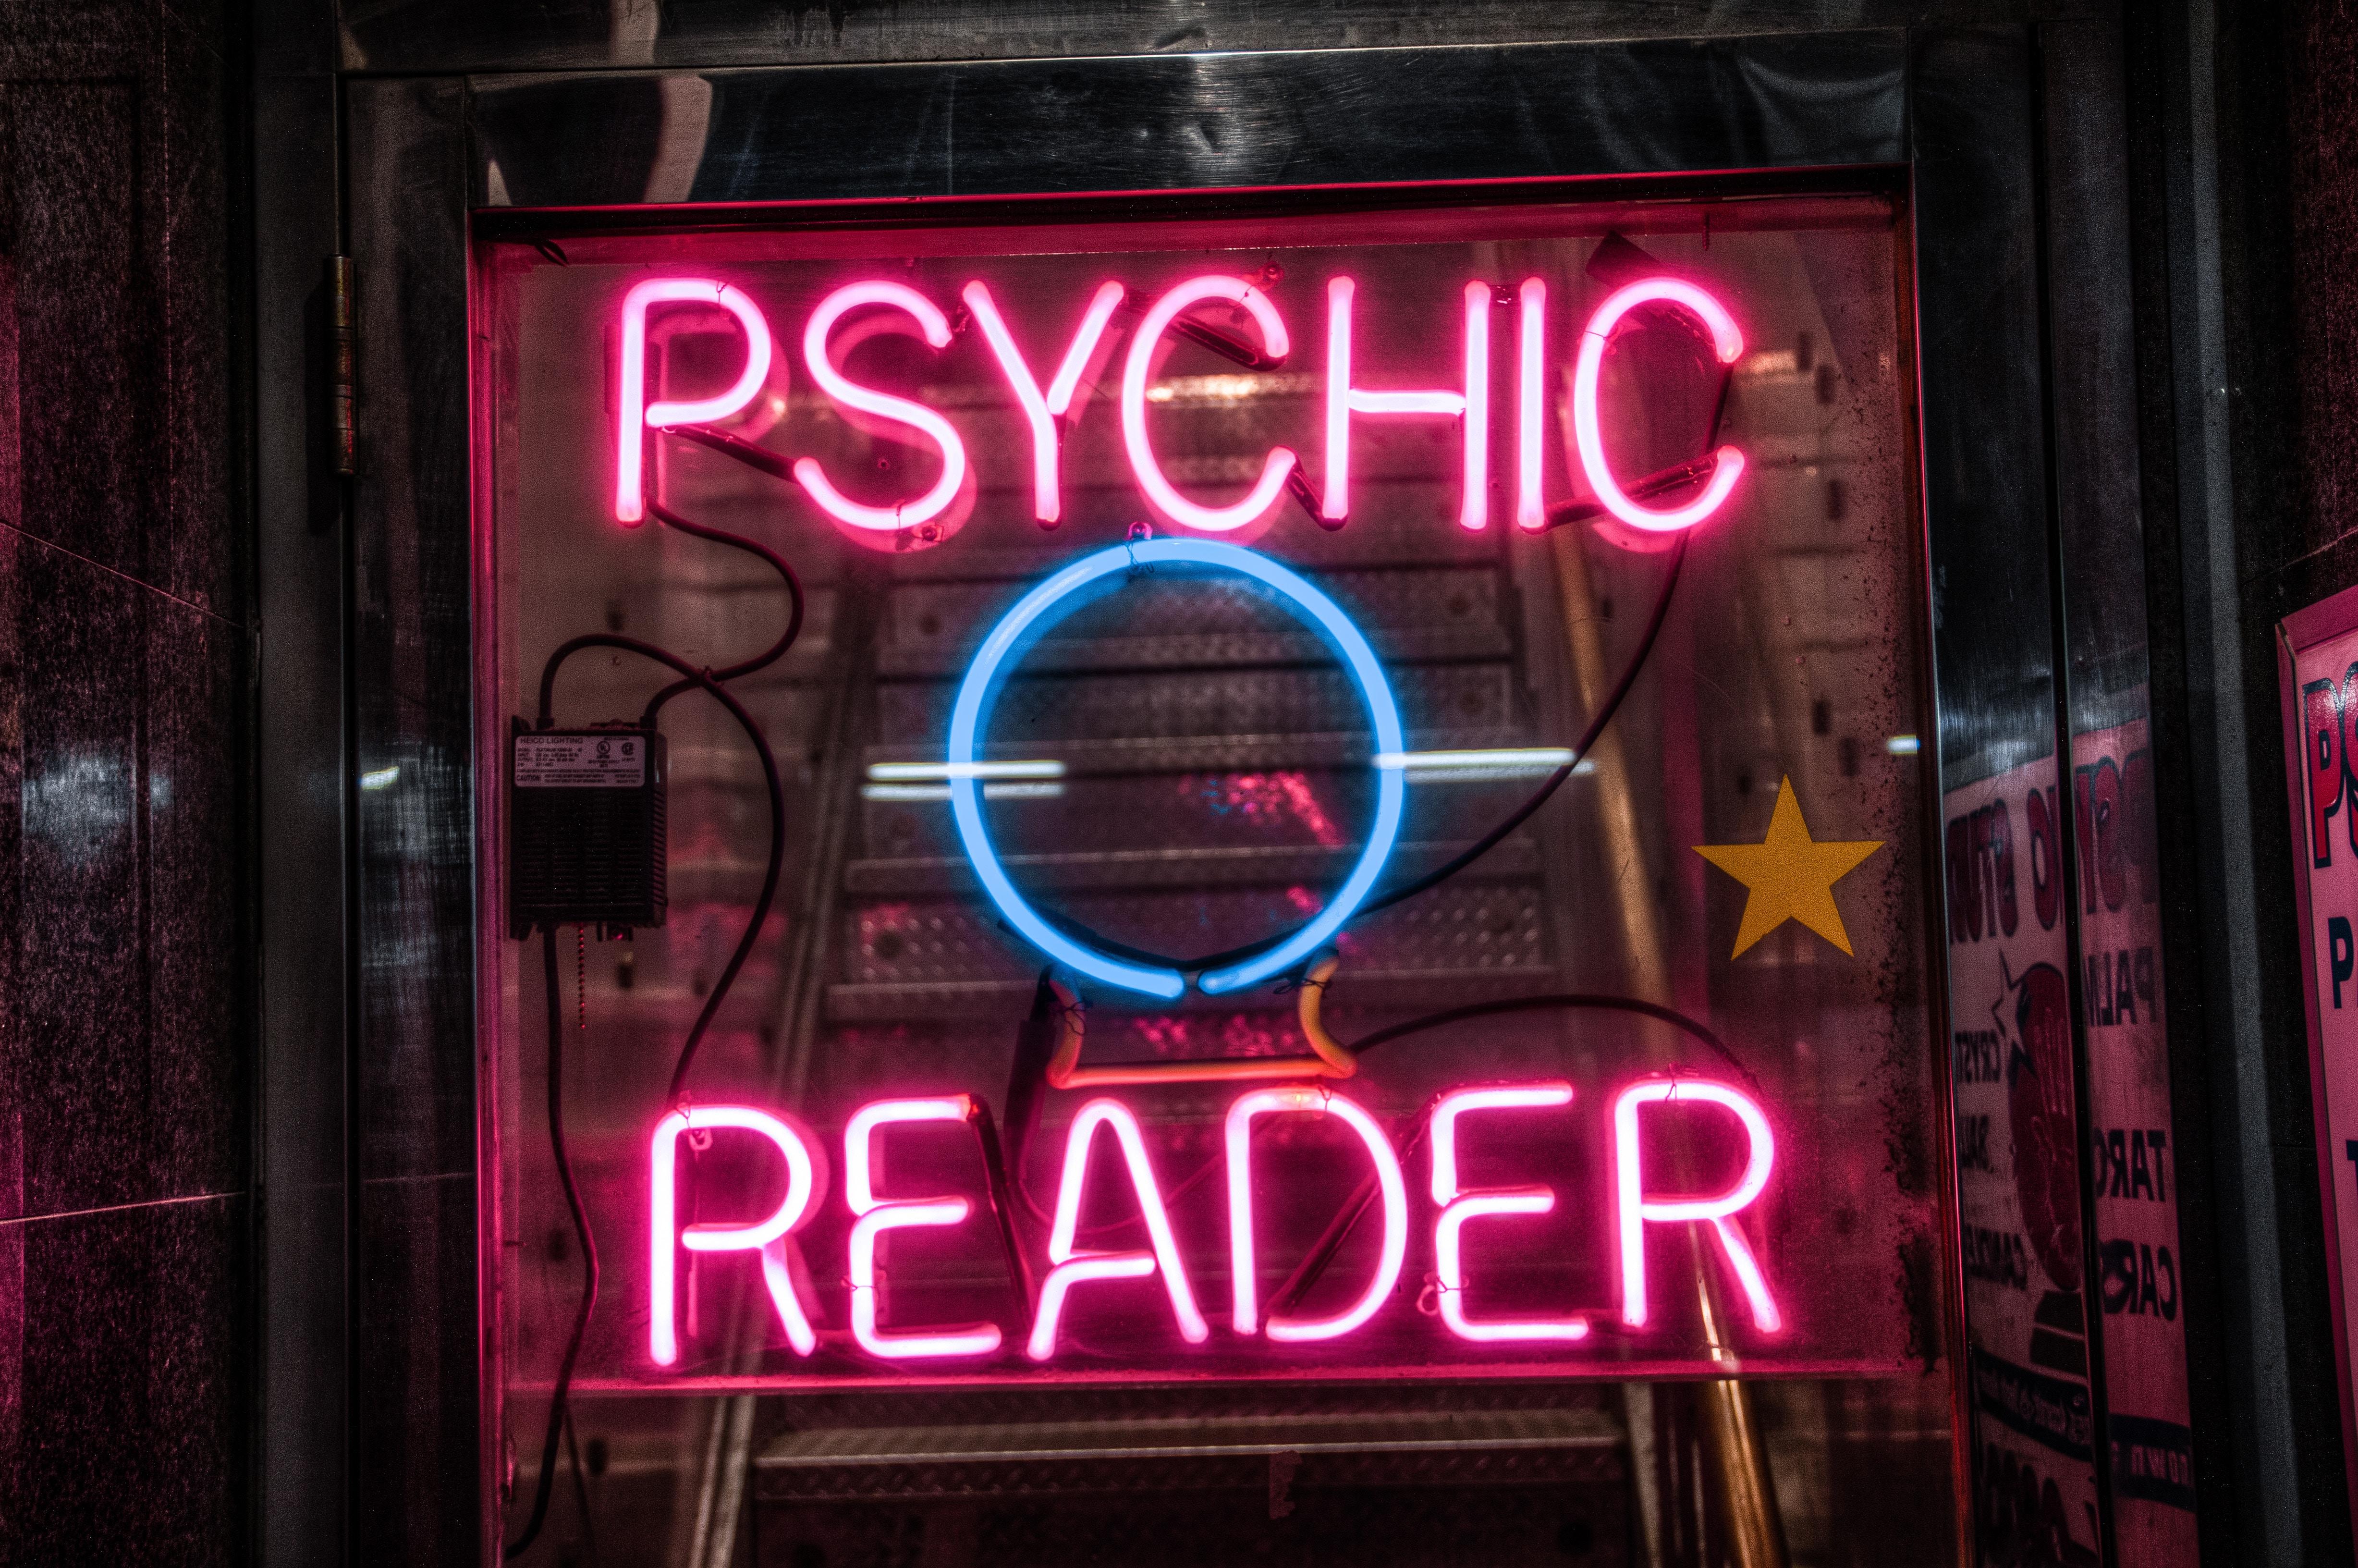 Psychic Reader Storefront